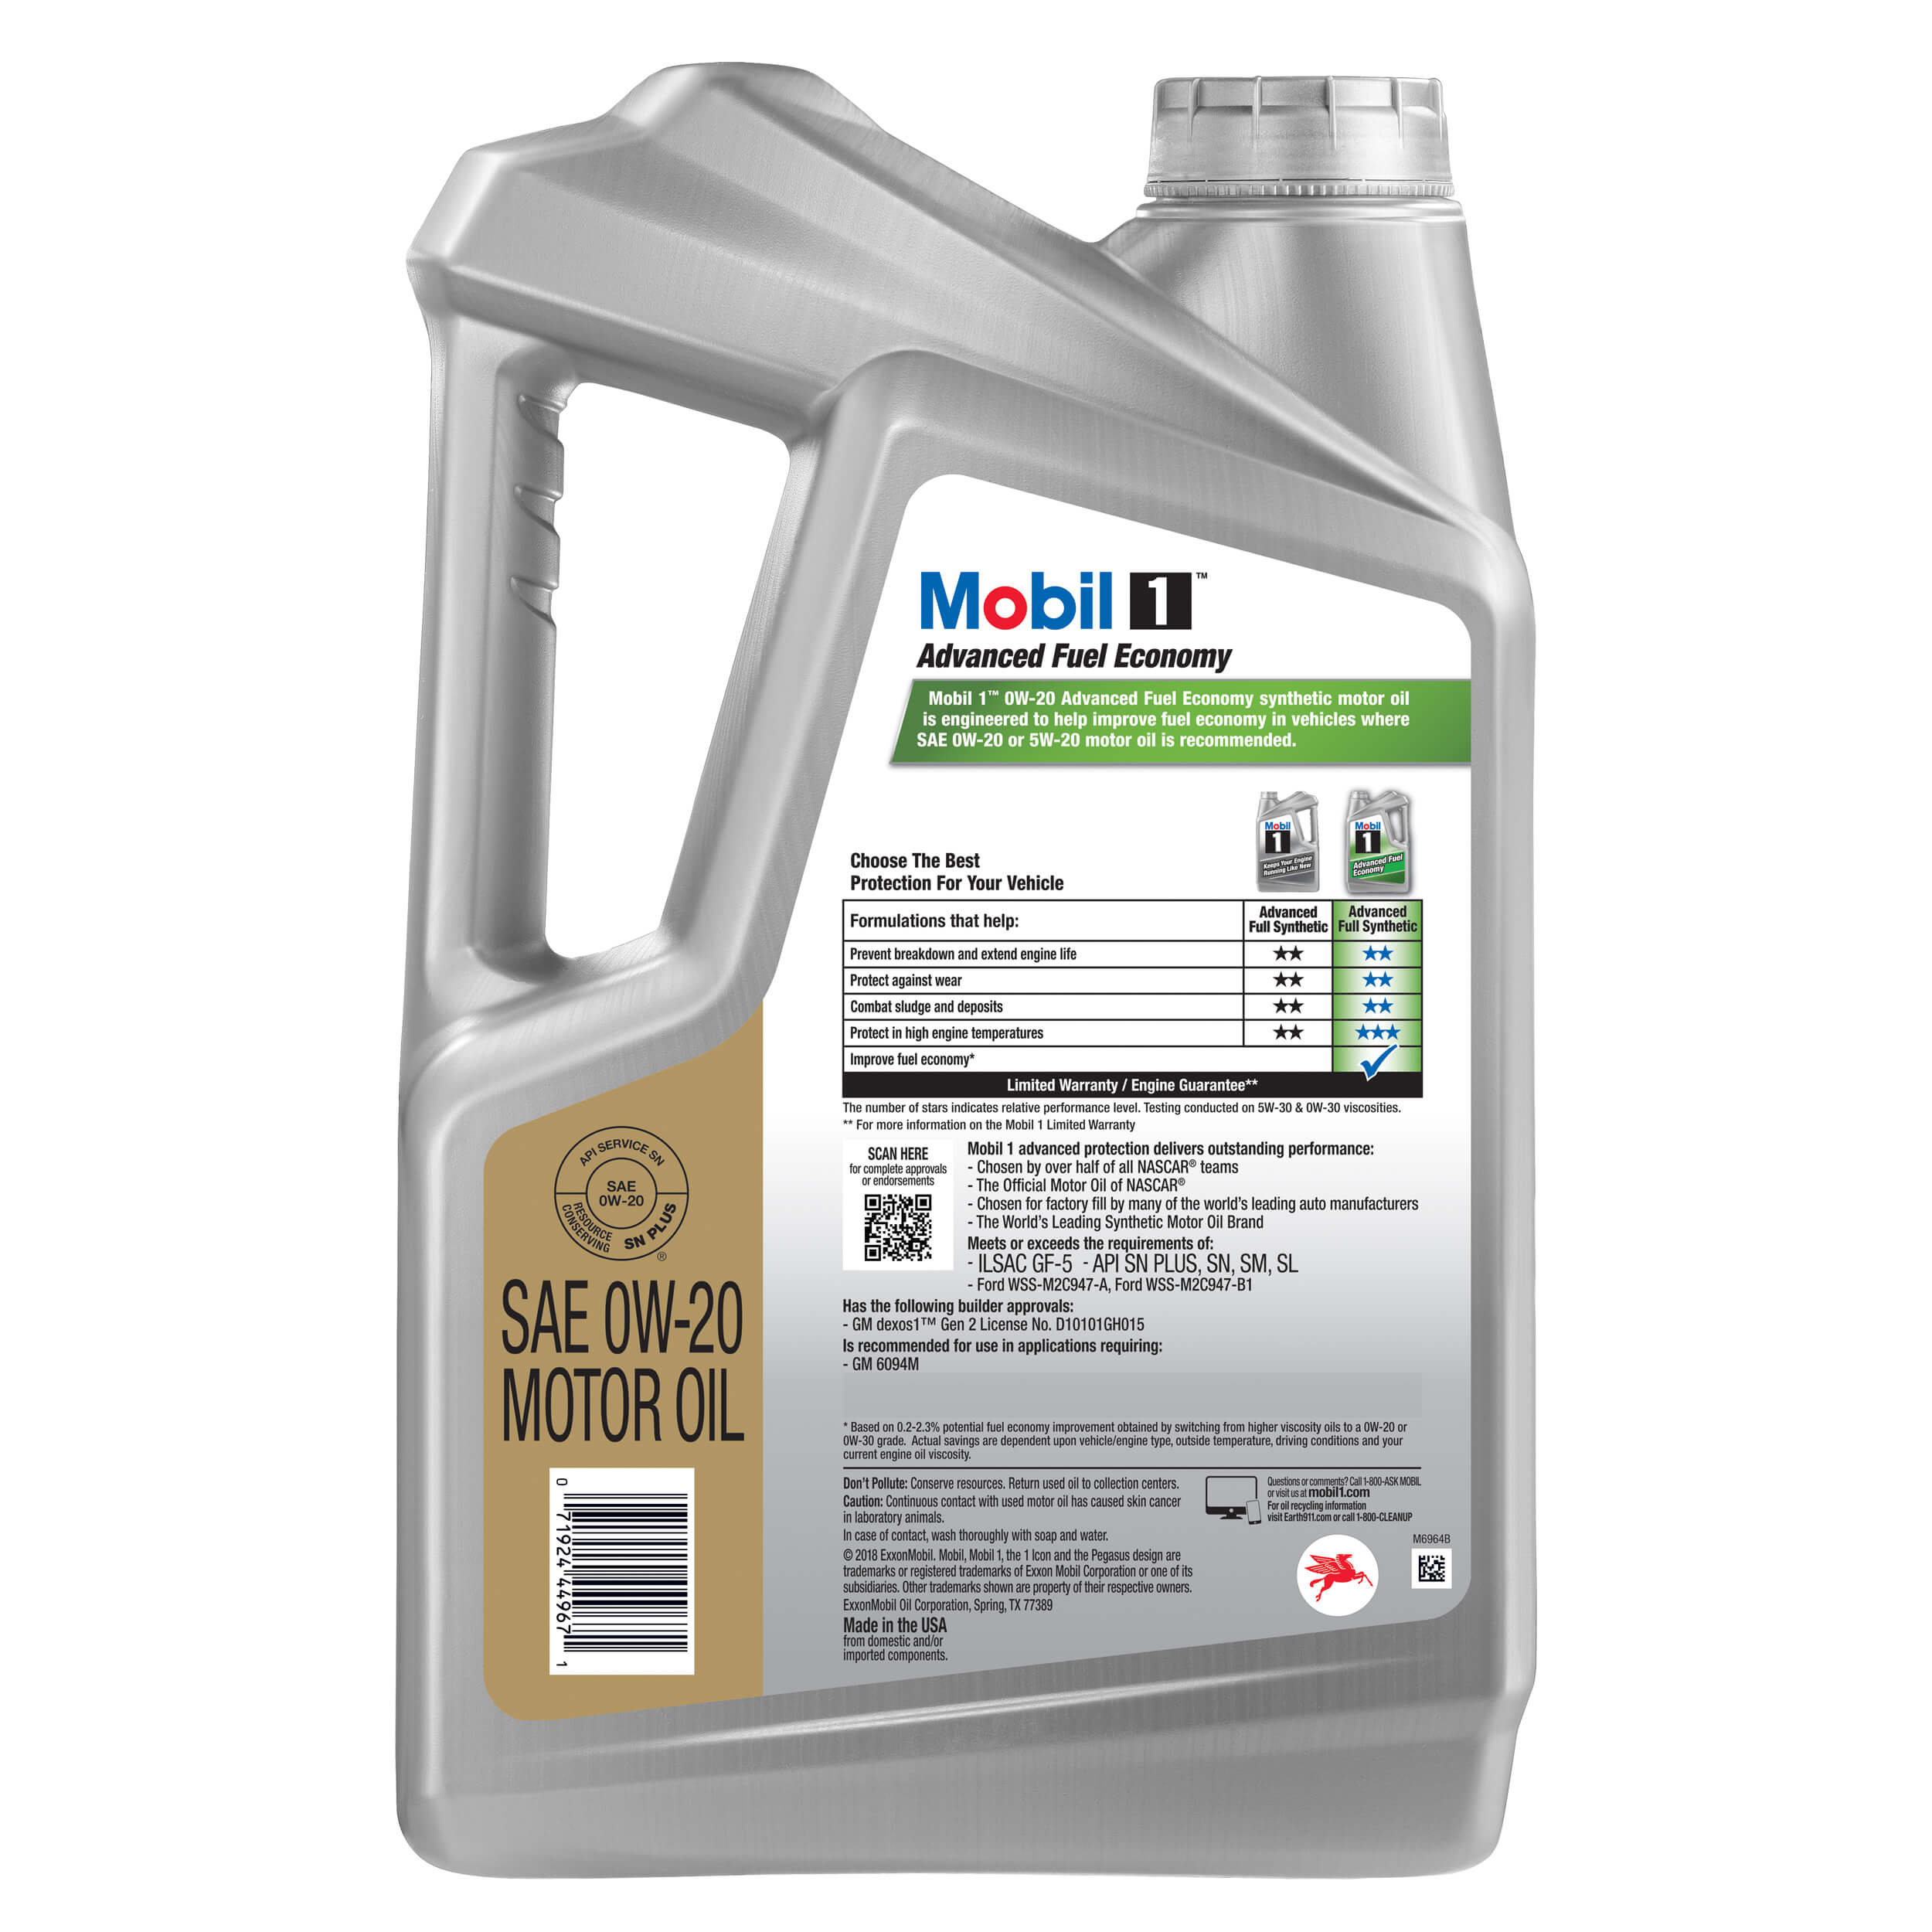 Mobil 1 Advanced Fuel Economy Full Synthetic Motor Oil 0W-20, 5-qt